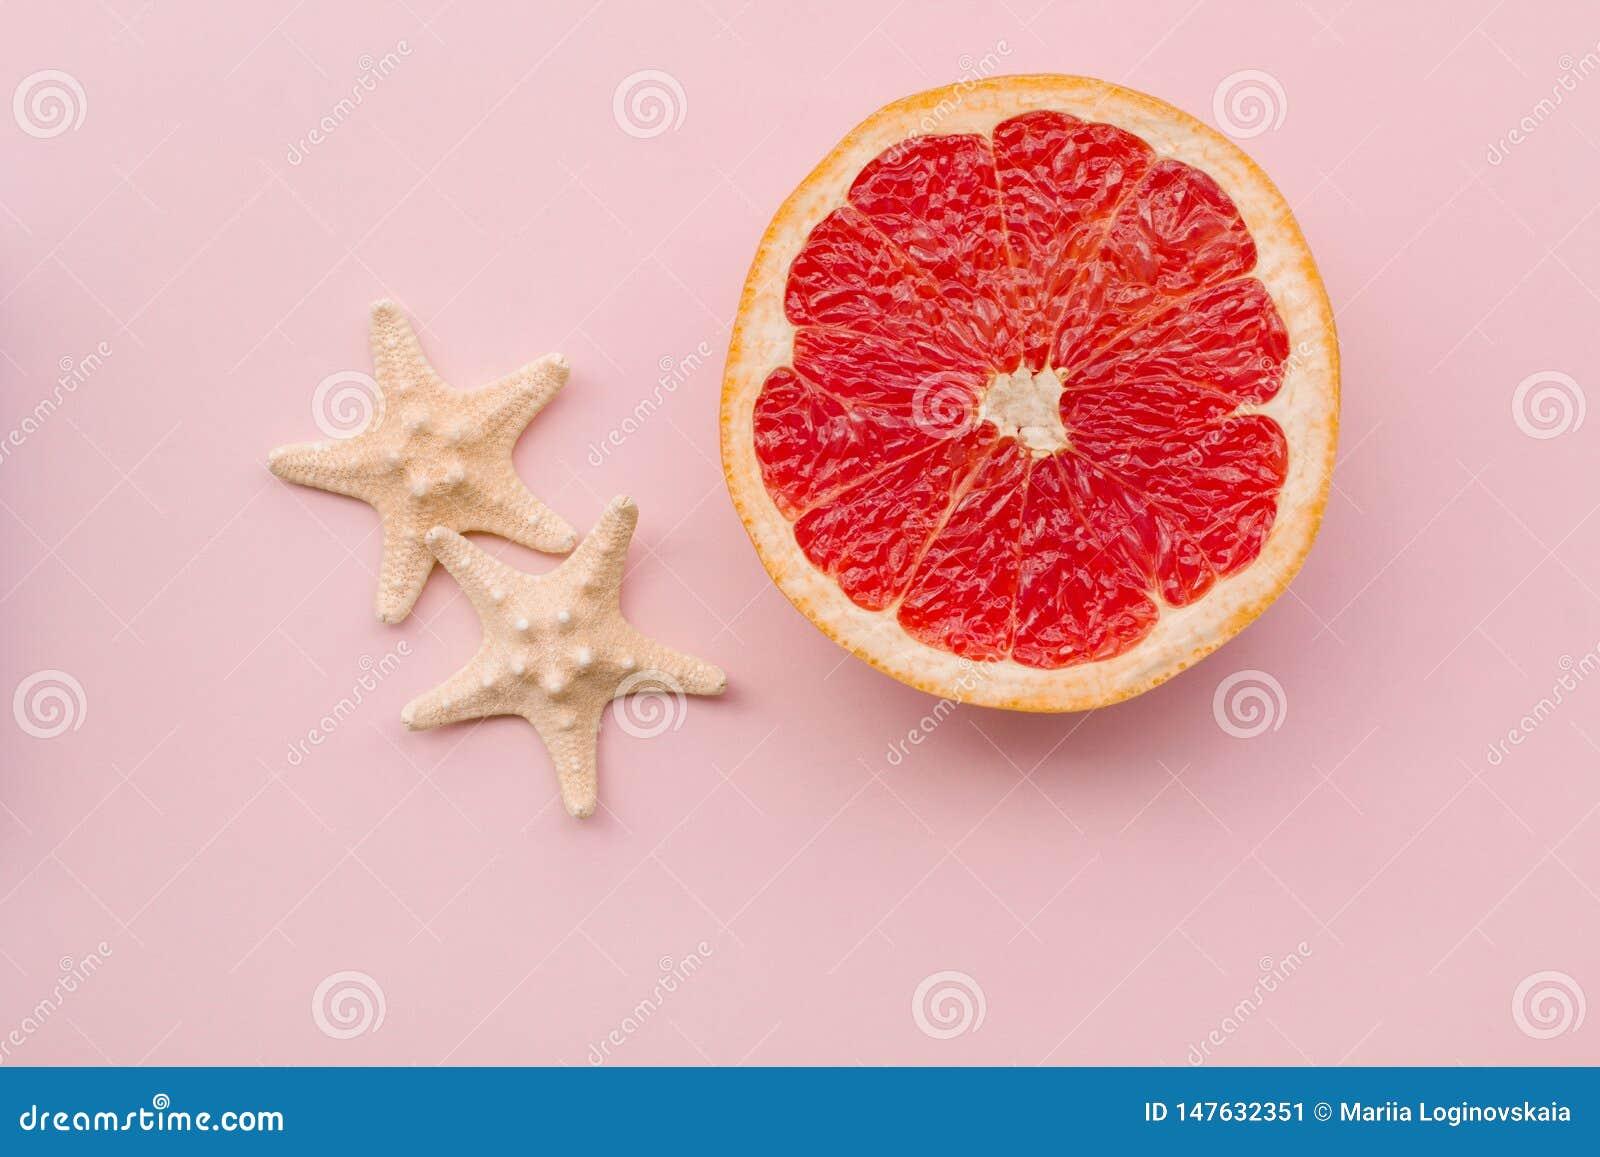 Fashion. Tropical Fresh Summer Set. Fashion Design. Fruit Citrus. Grapefruit. Bright Color. Creative Art. Minimal. Fashion Top Vie